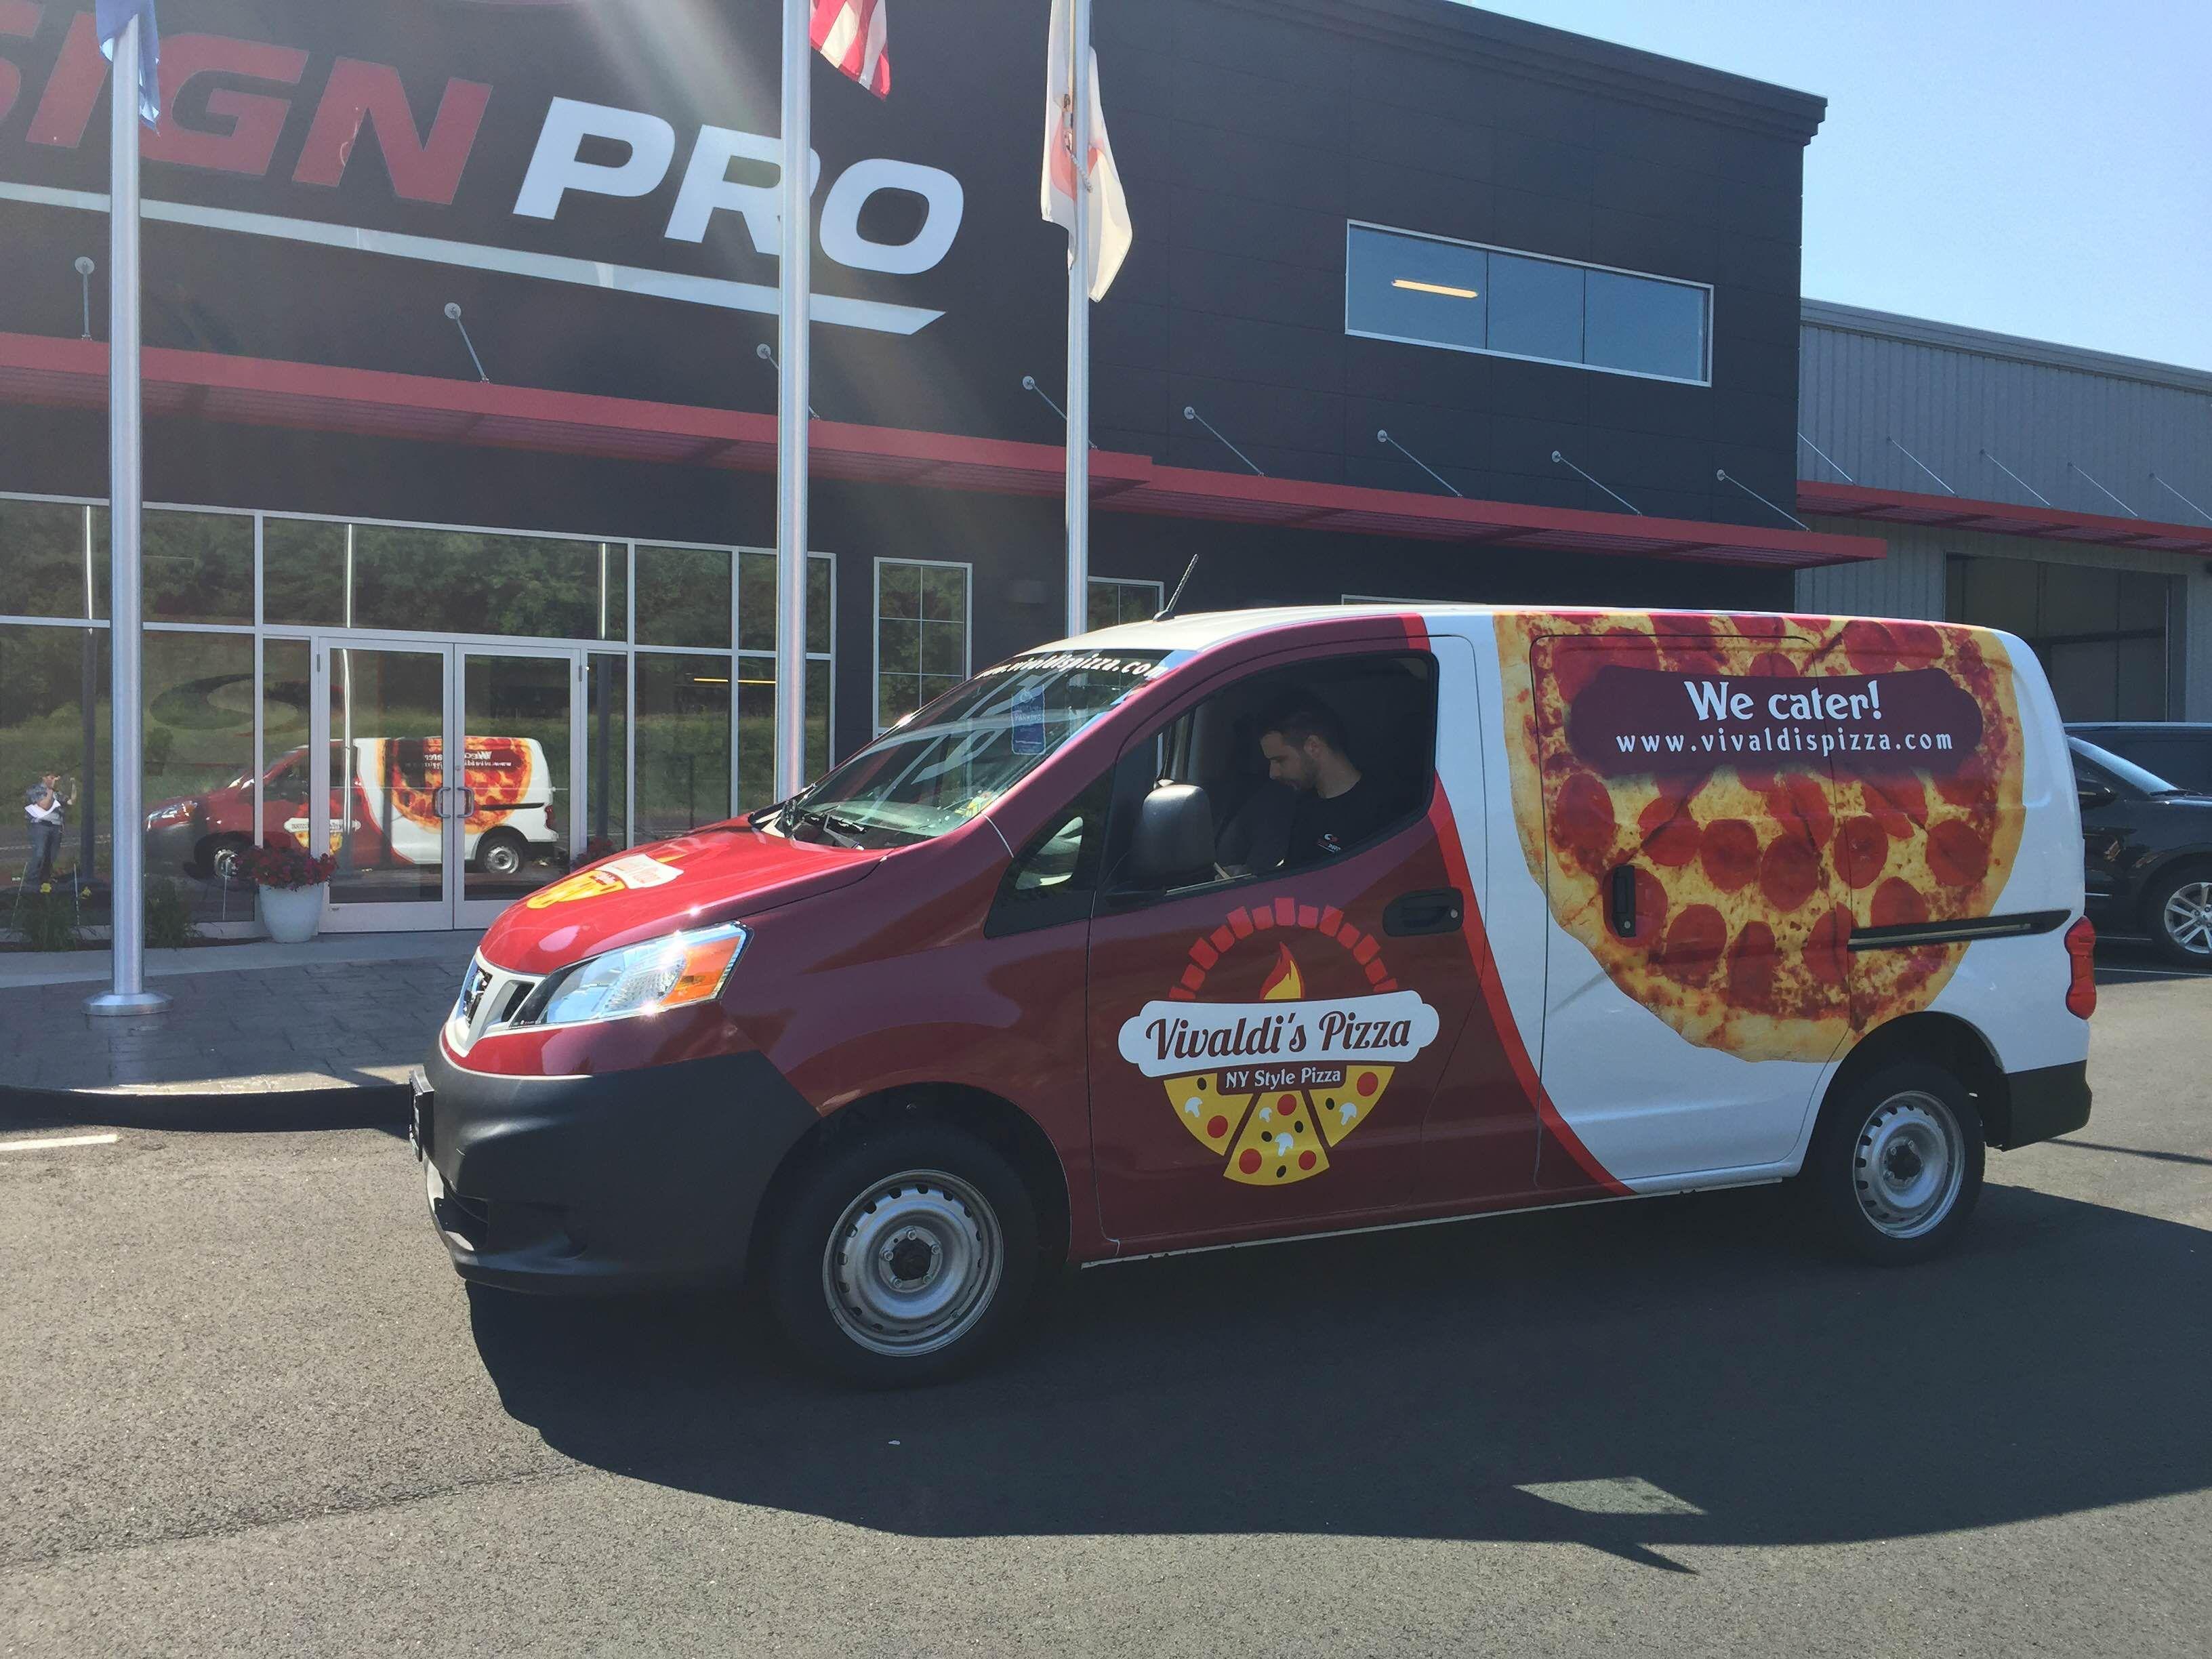 Vivaldi Pizza Vehicle Wrap Done By Sign Pro Inc Car Wrap